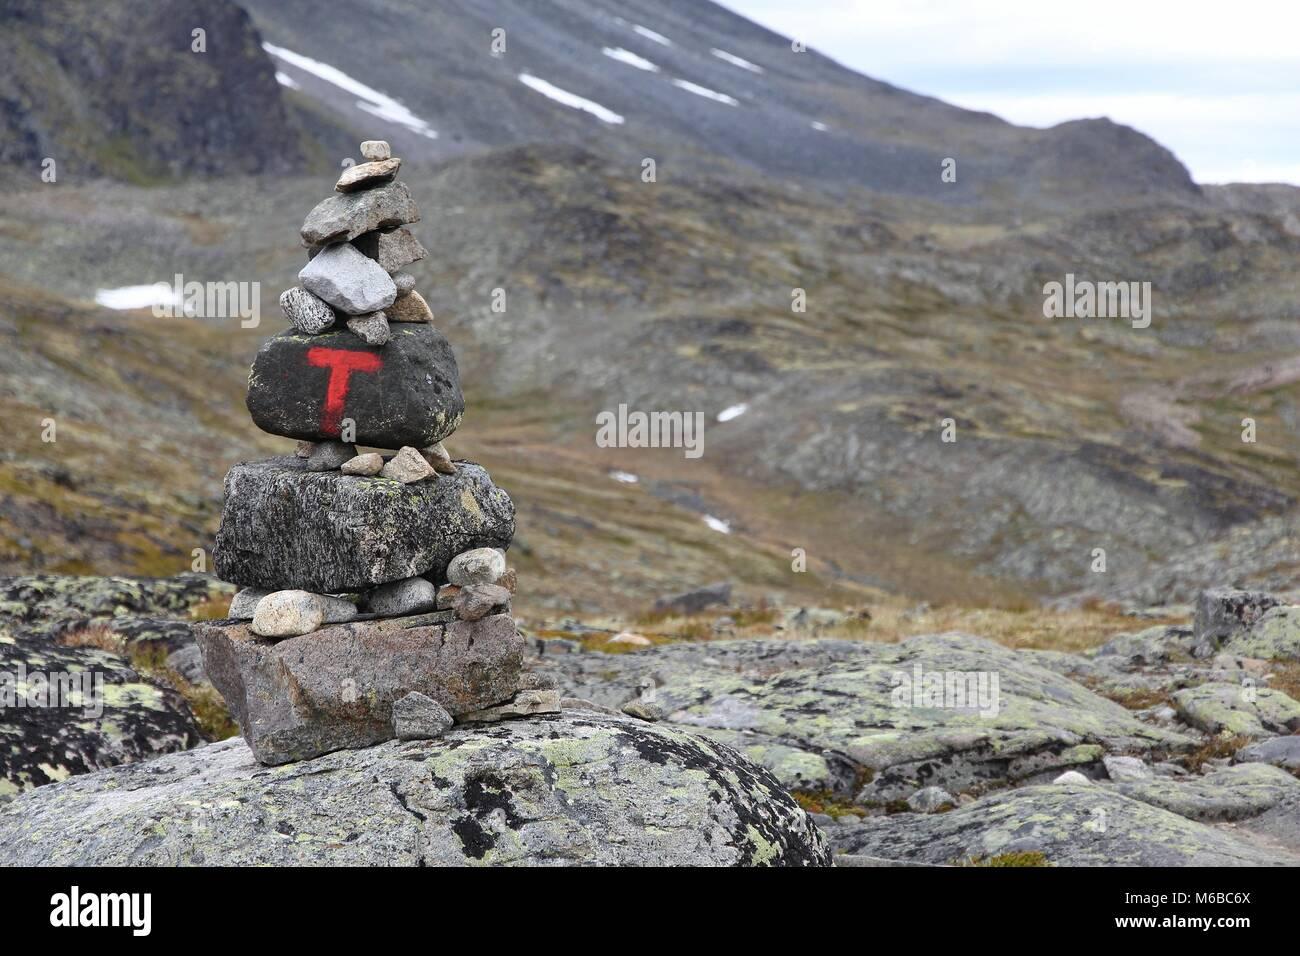 Norway nature - Jotunheimen National Park. Besseggen ridge trail marking cairns. - Stock Image